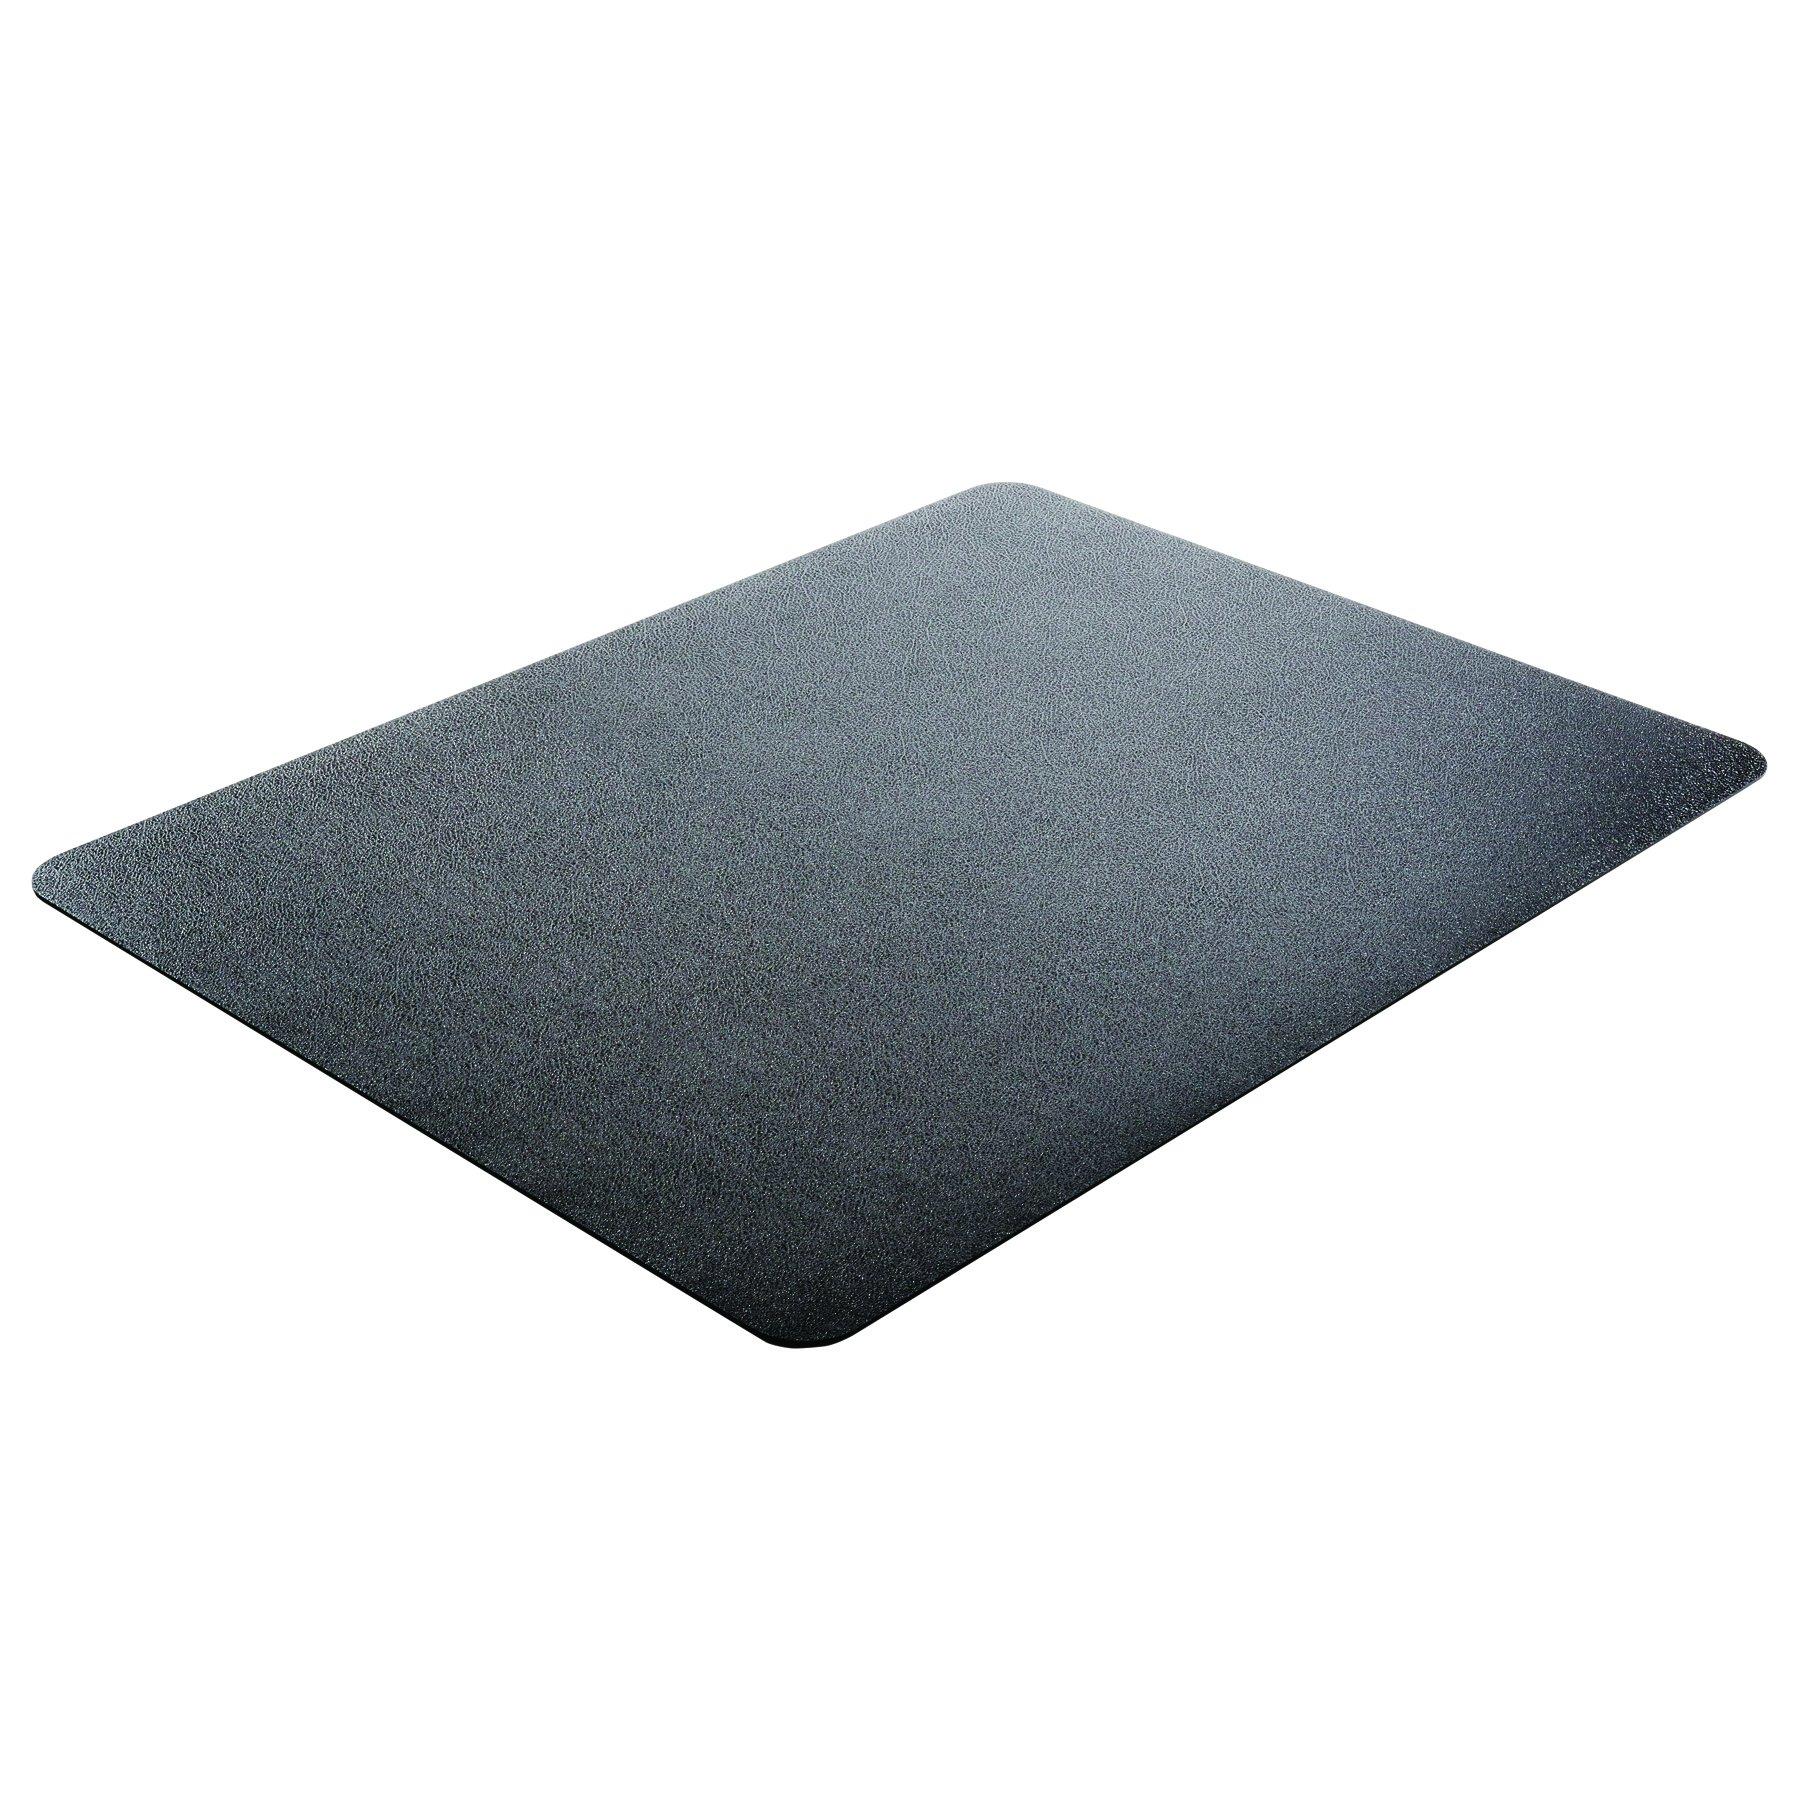 Deflecto EconoMat Black Chair Mat, Hard Floor Use, Rectangle, Straight Edge, 46 x 60 Inches (CM21442FBLK)